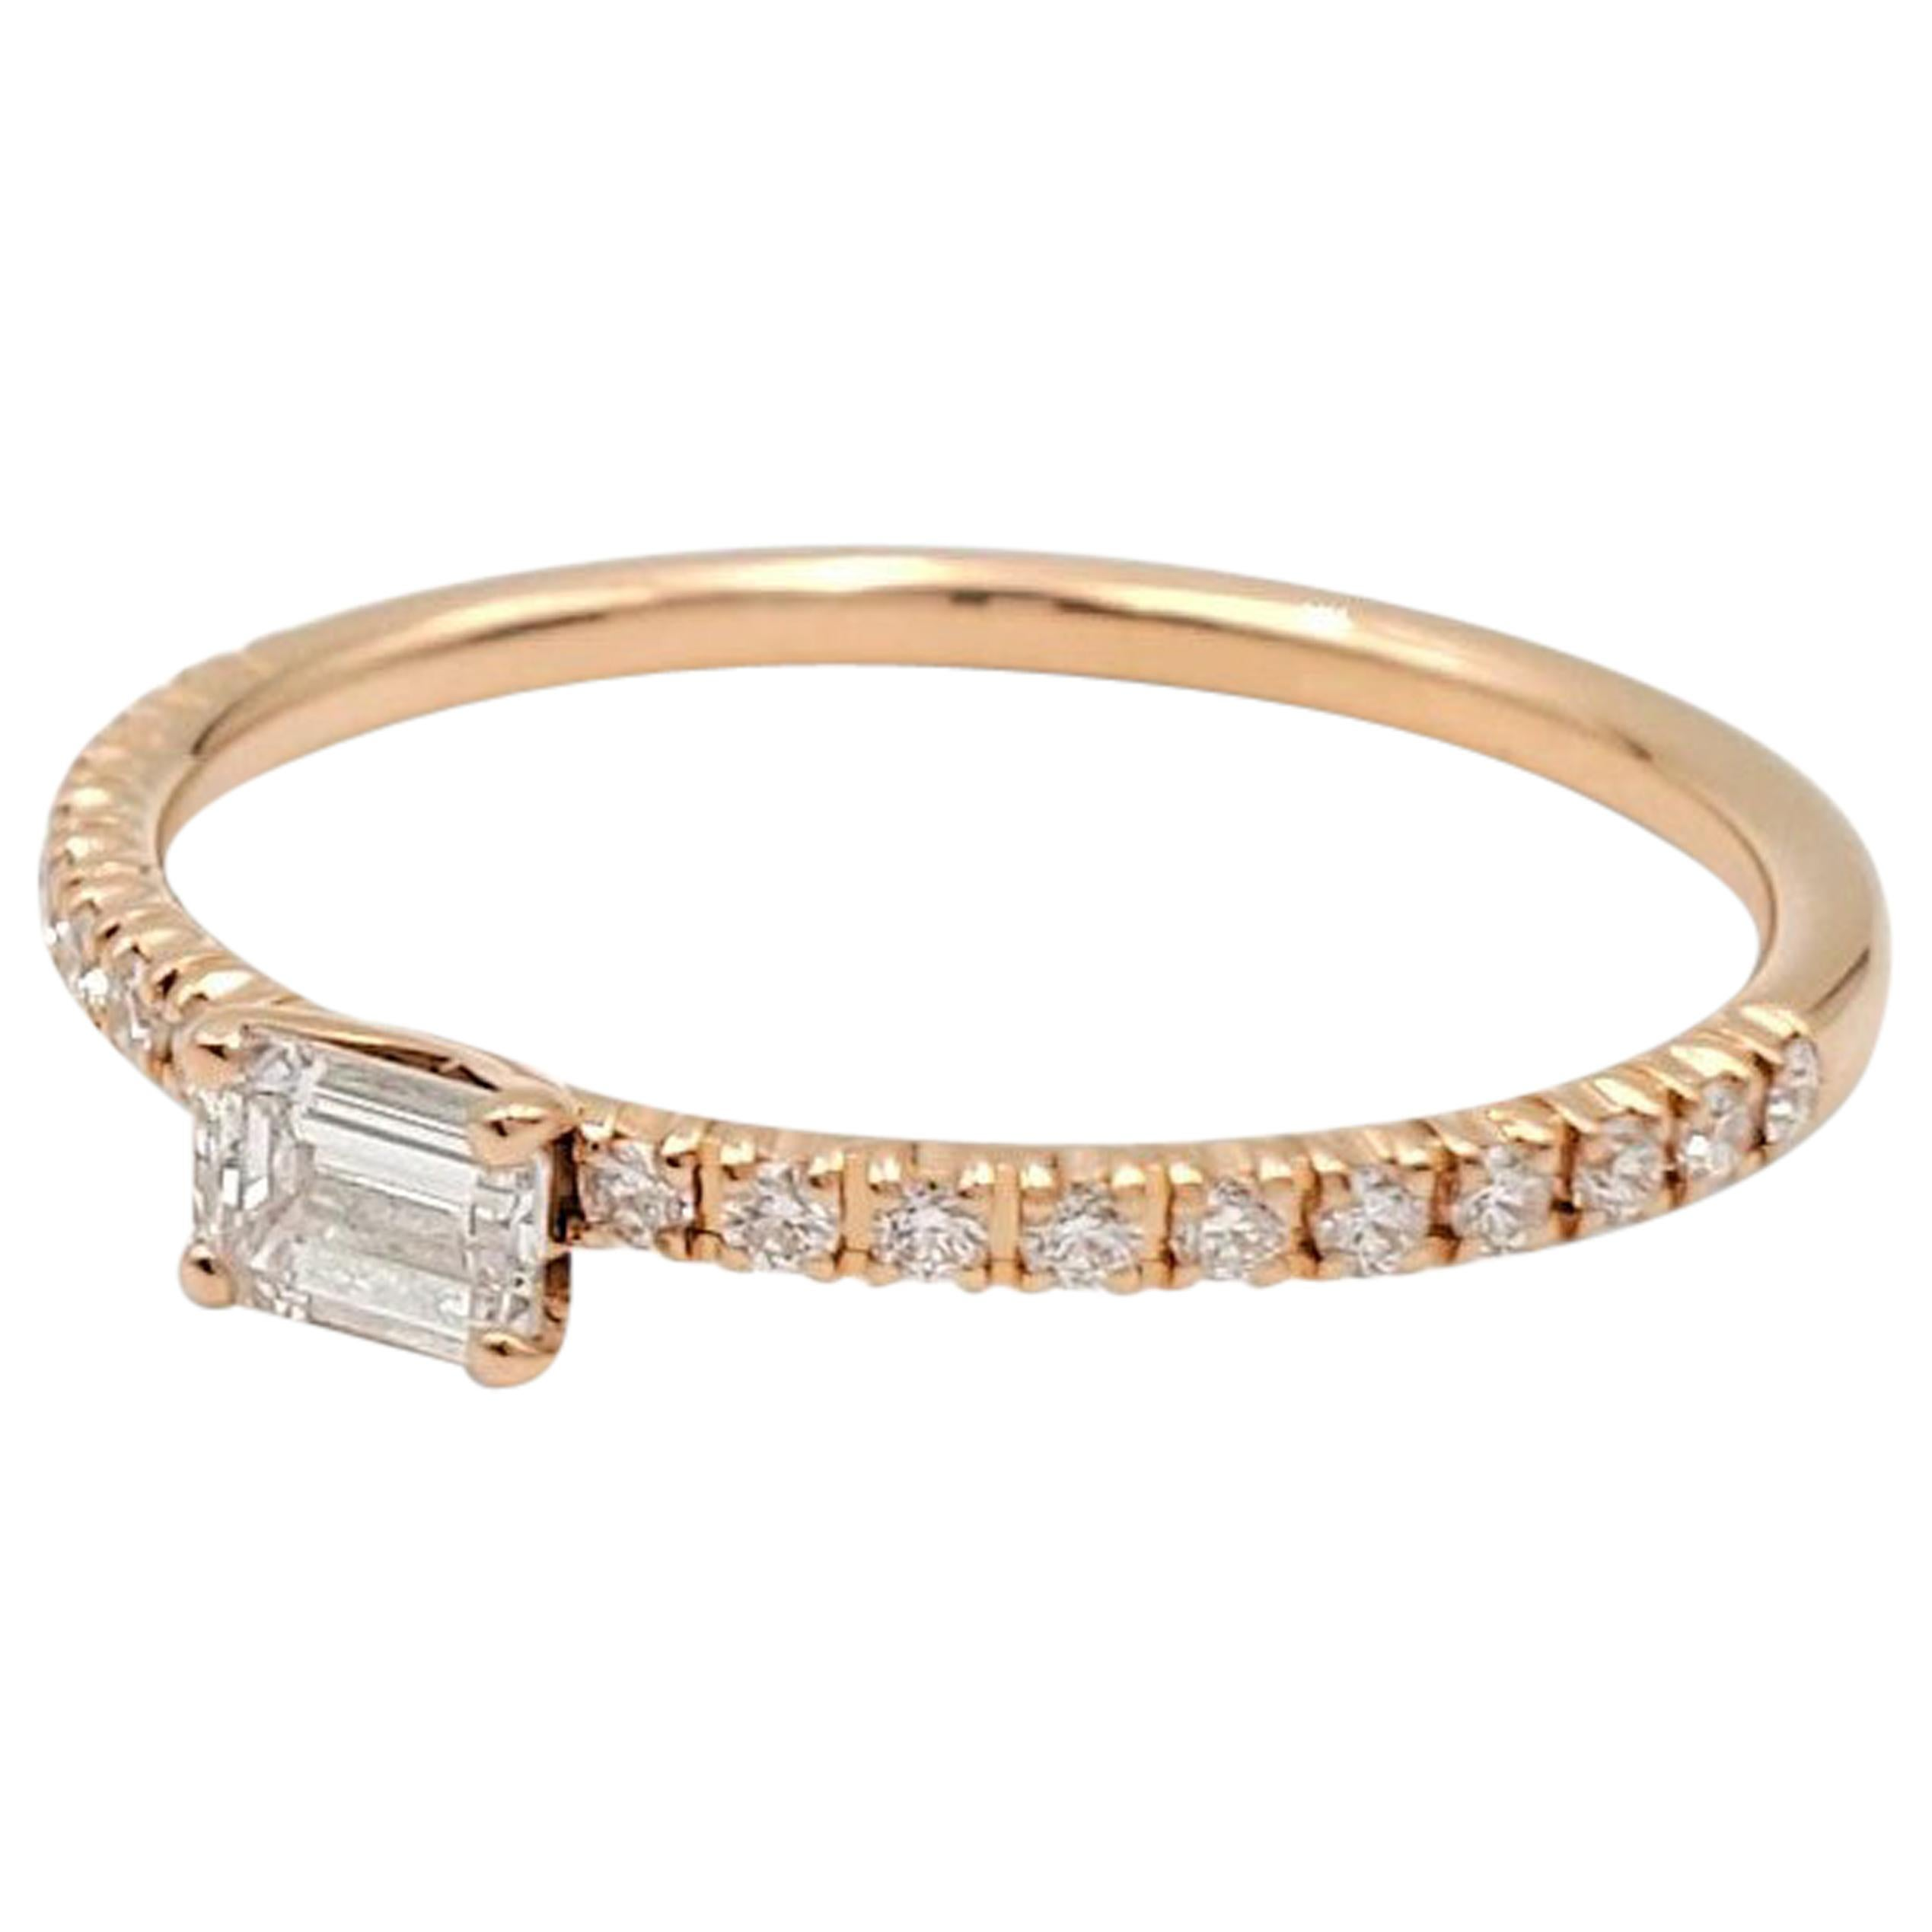 Cartier 'Étincelle de Cartier' Rose Gold and Diamond Ring